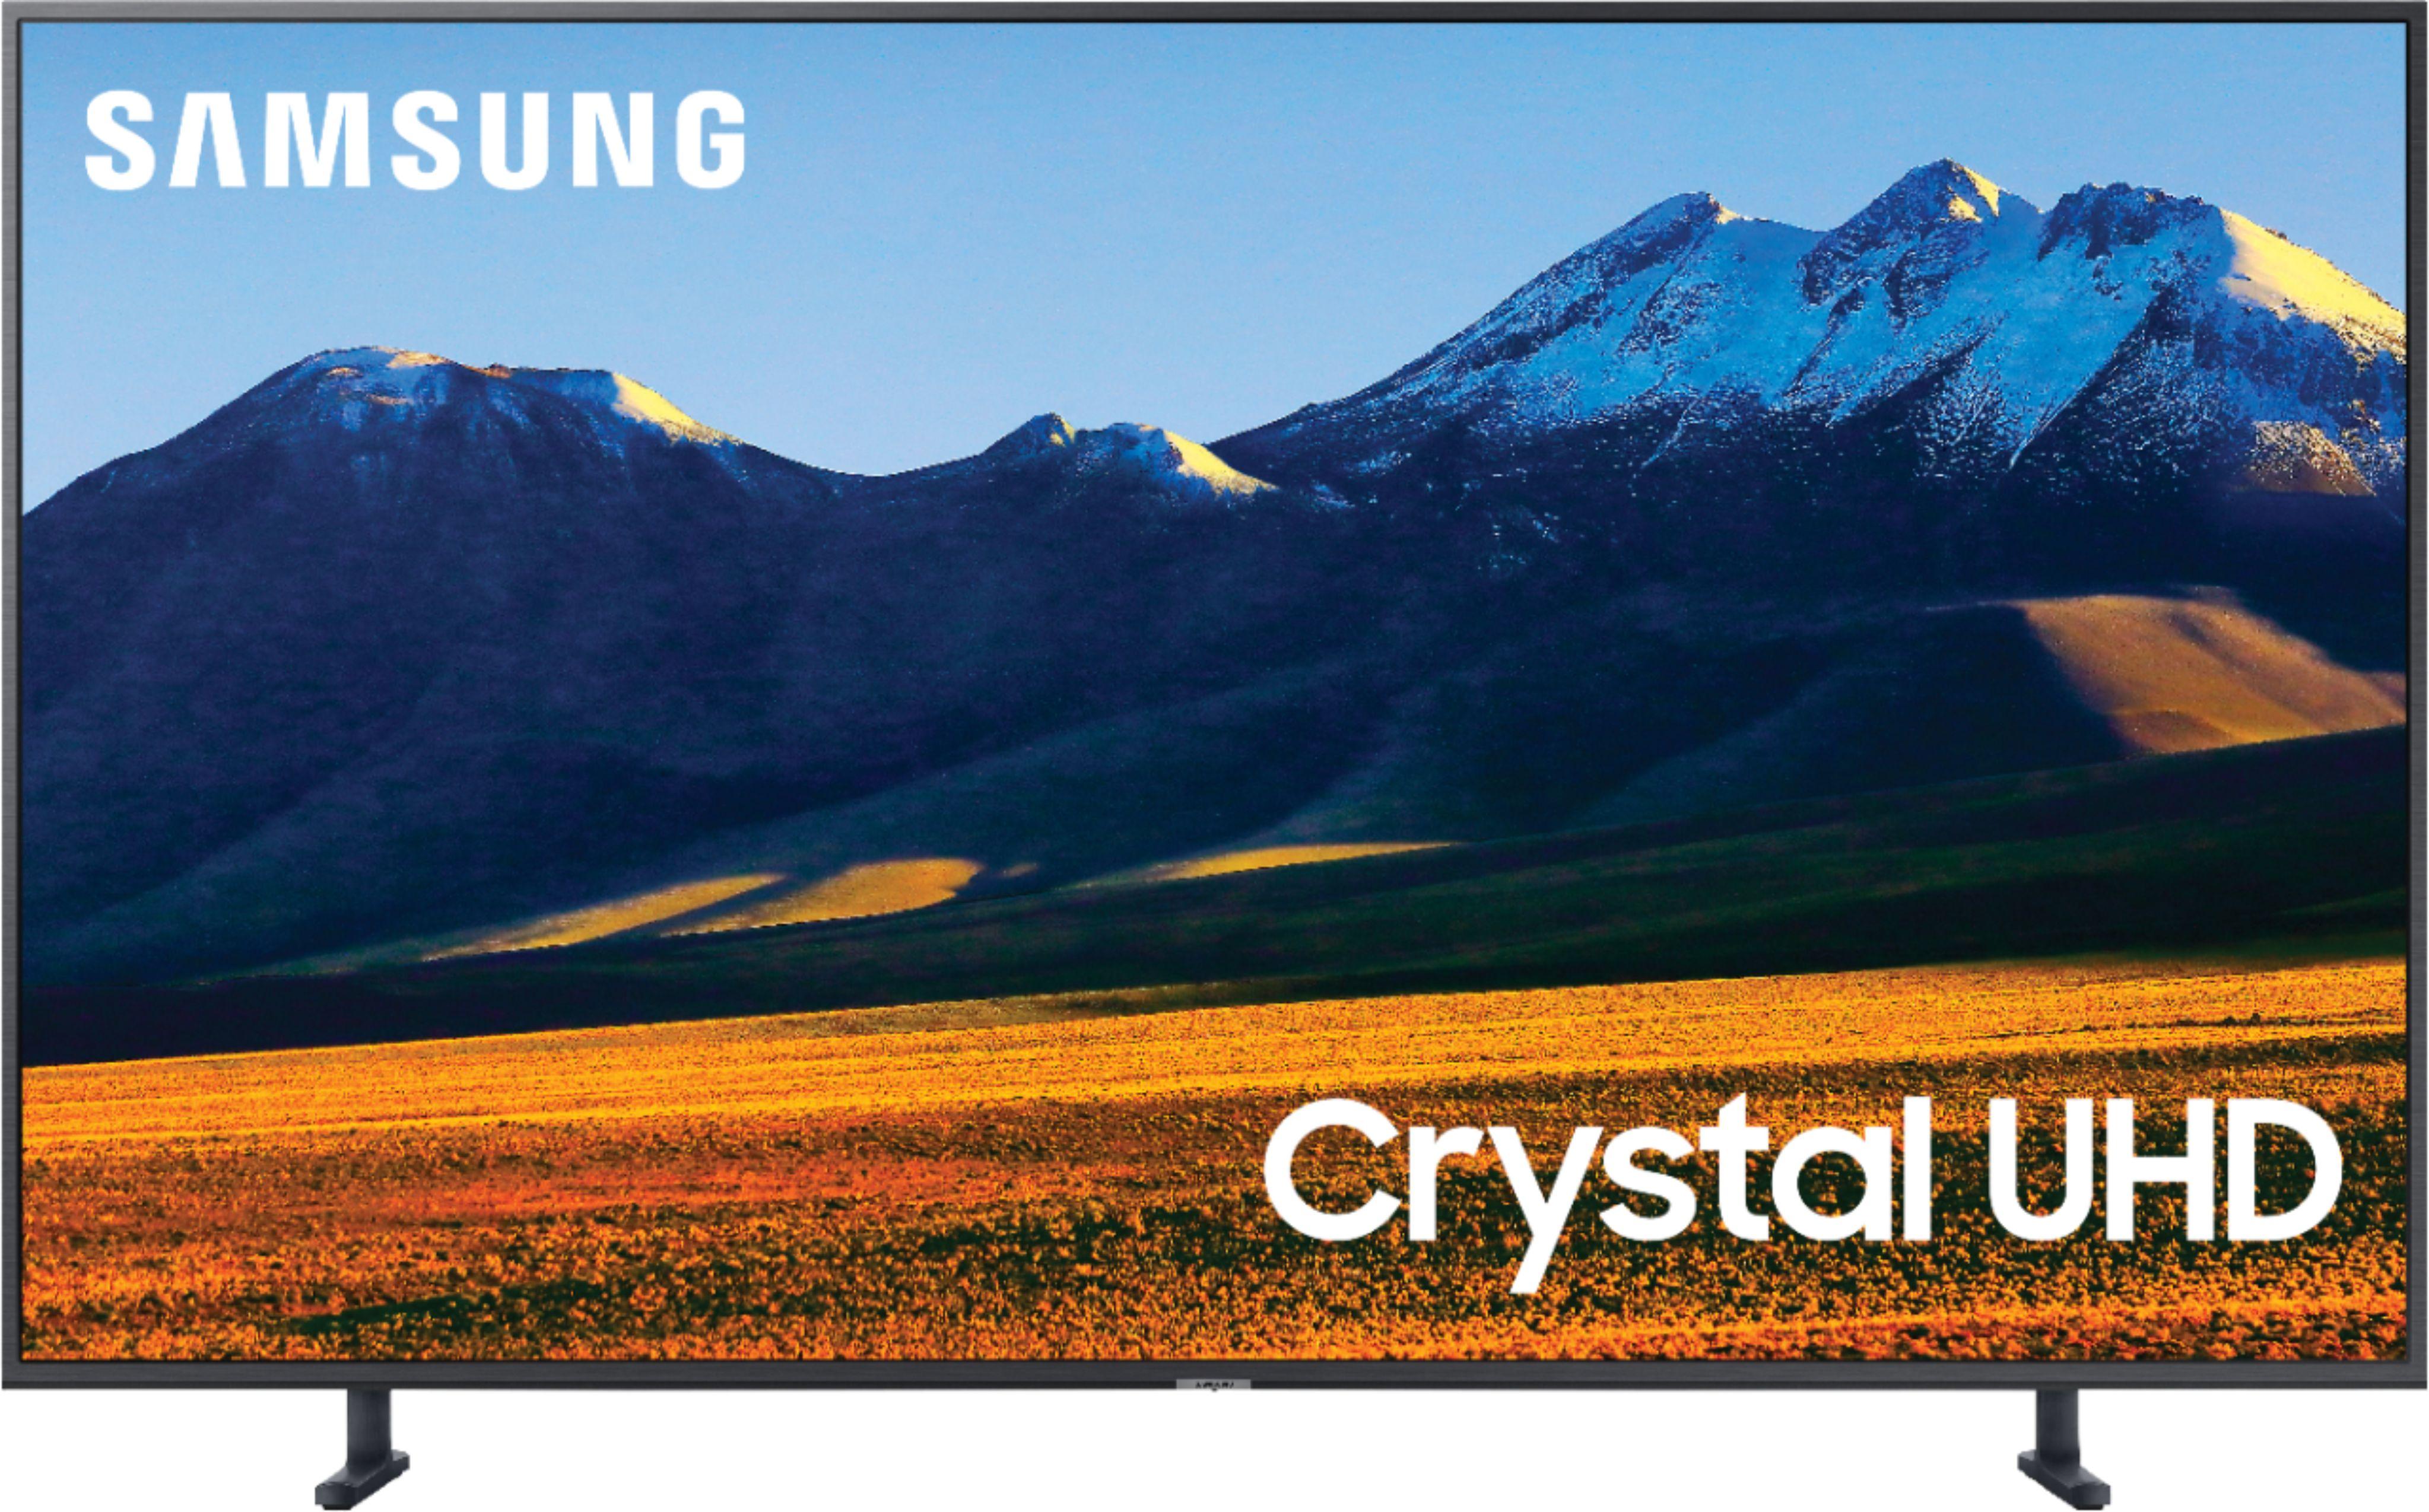 "Samsung - 75"" Class 9 Series LED 4K UHD Smart Tizen TV (UN75RU9000FXZA- 2020)  Free Shipping $999.99"